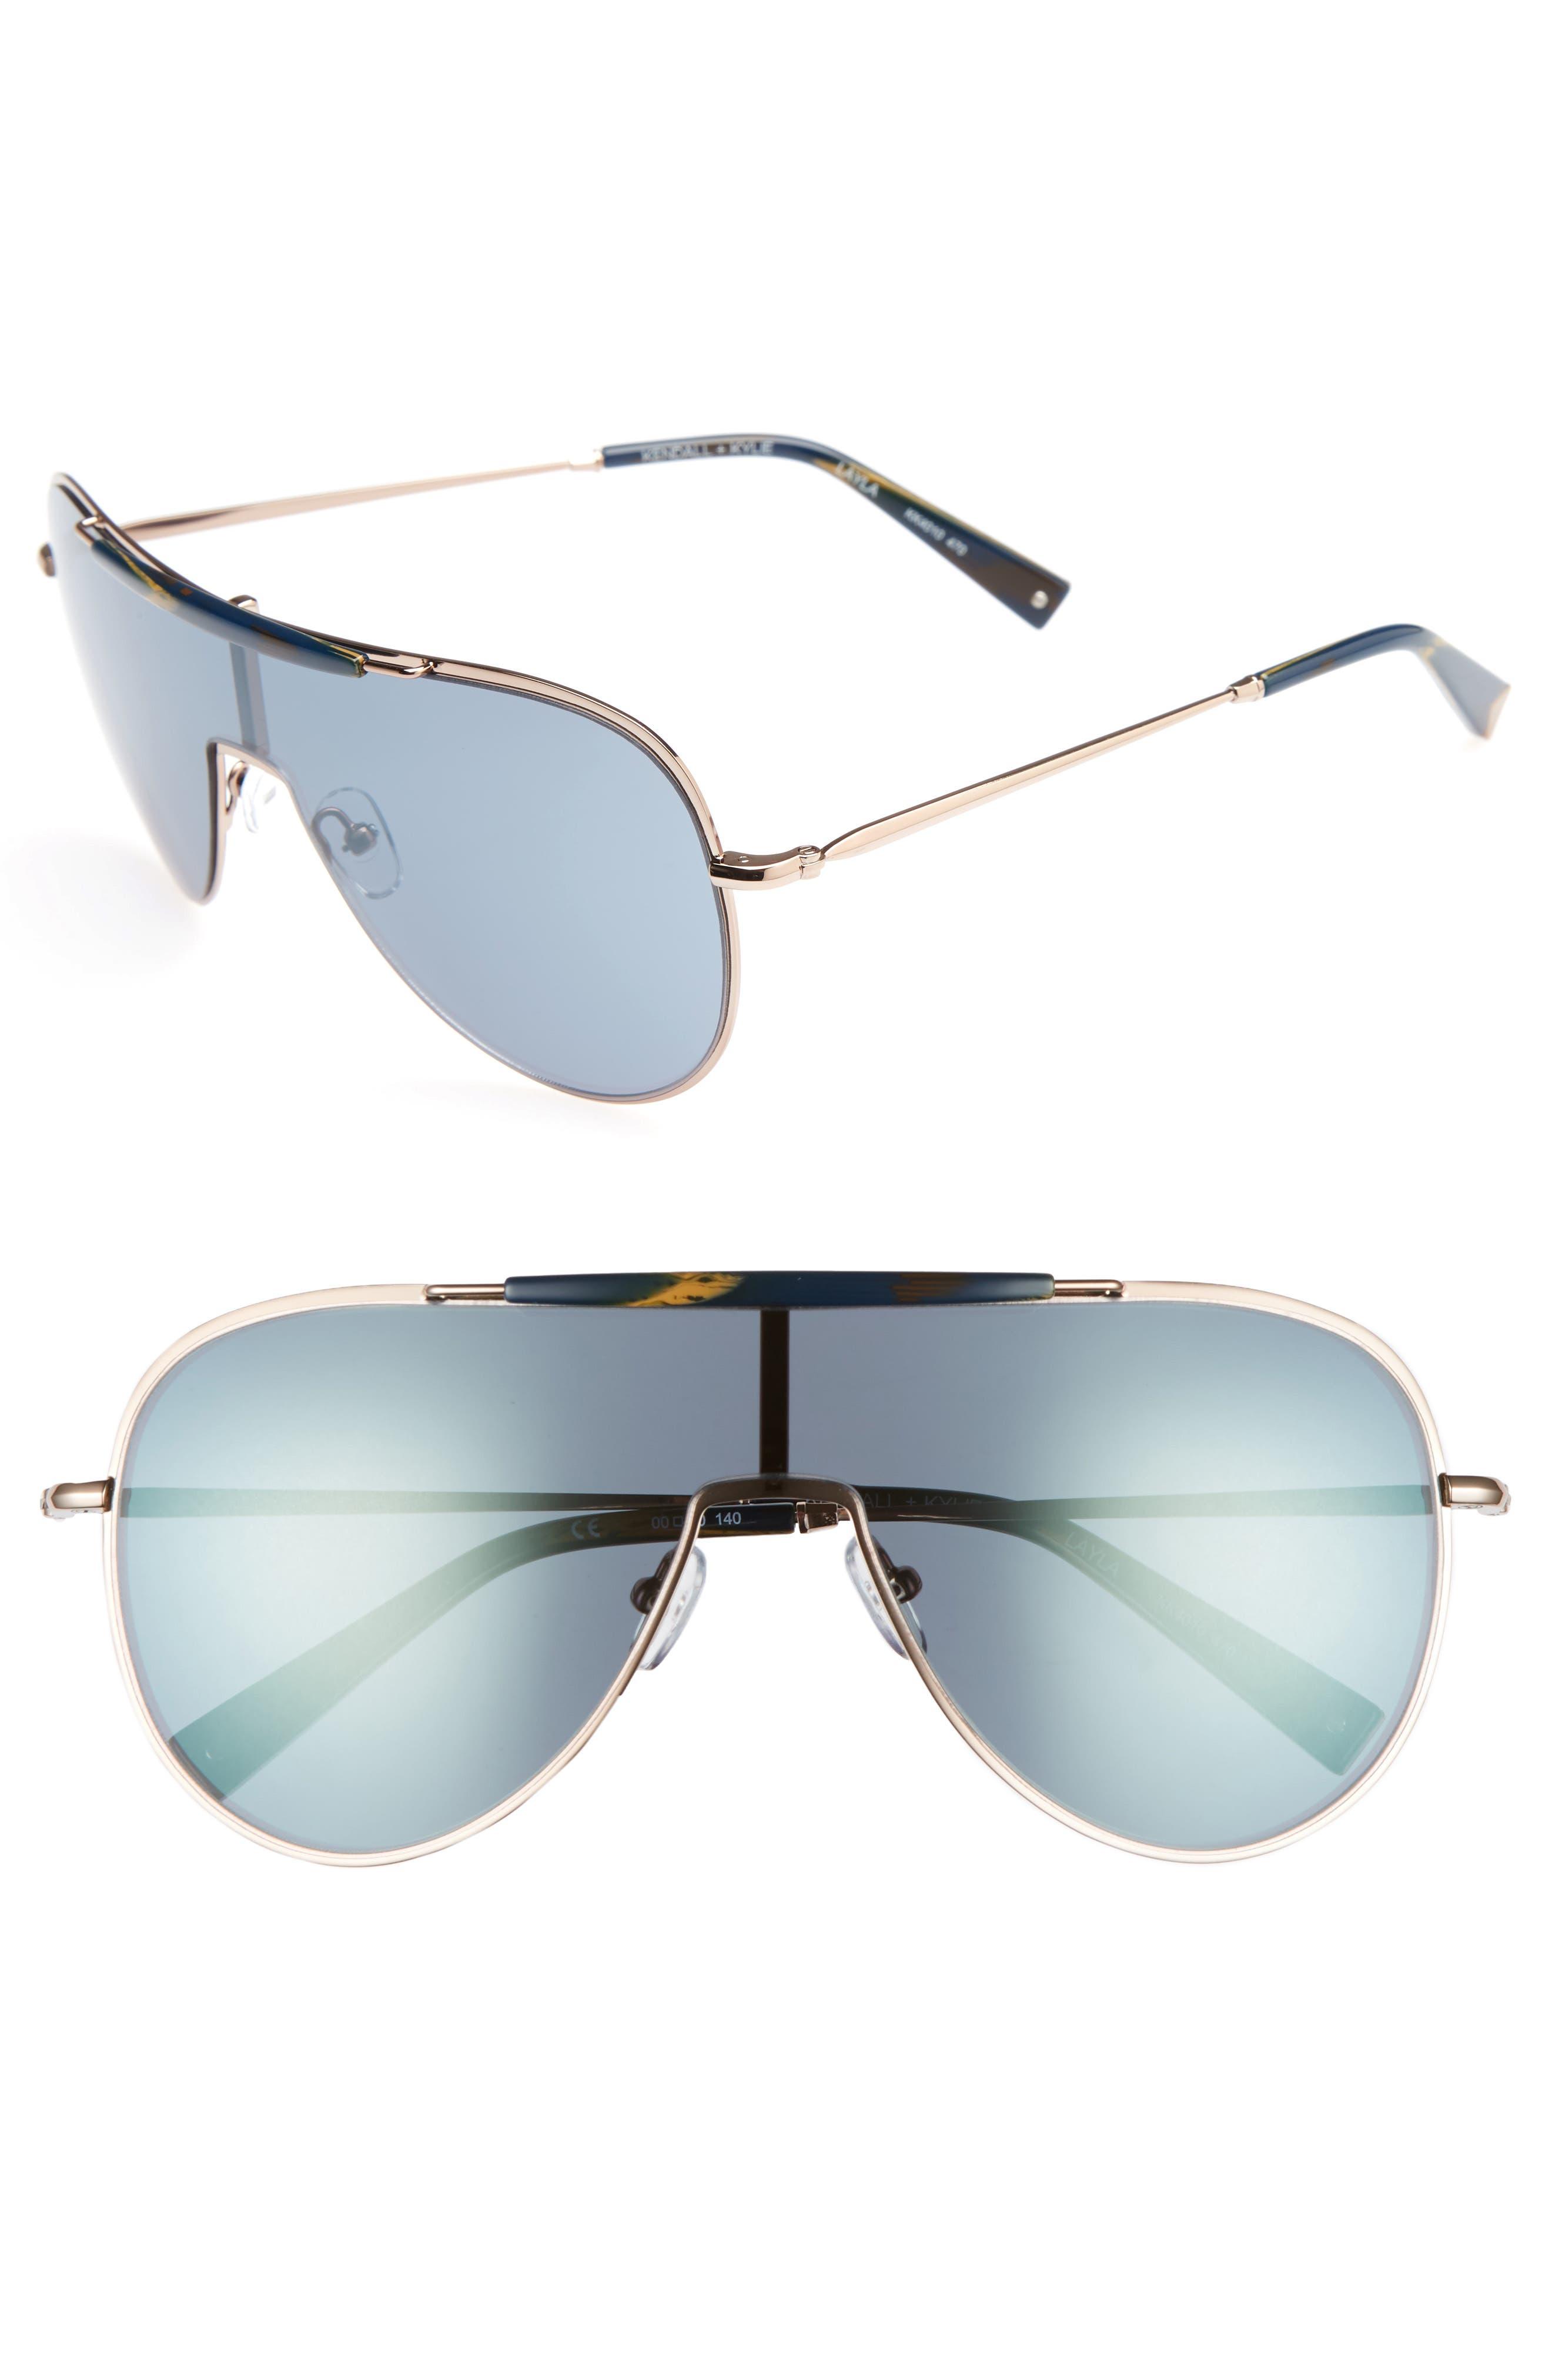 KENDALL + KYLIE Shield Aviator Sunglasses